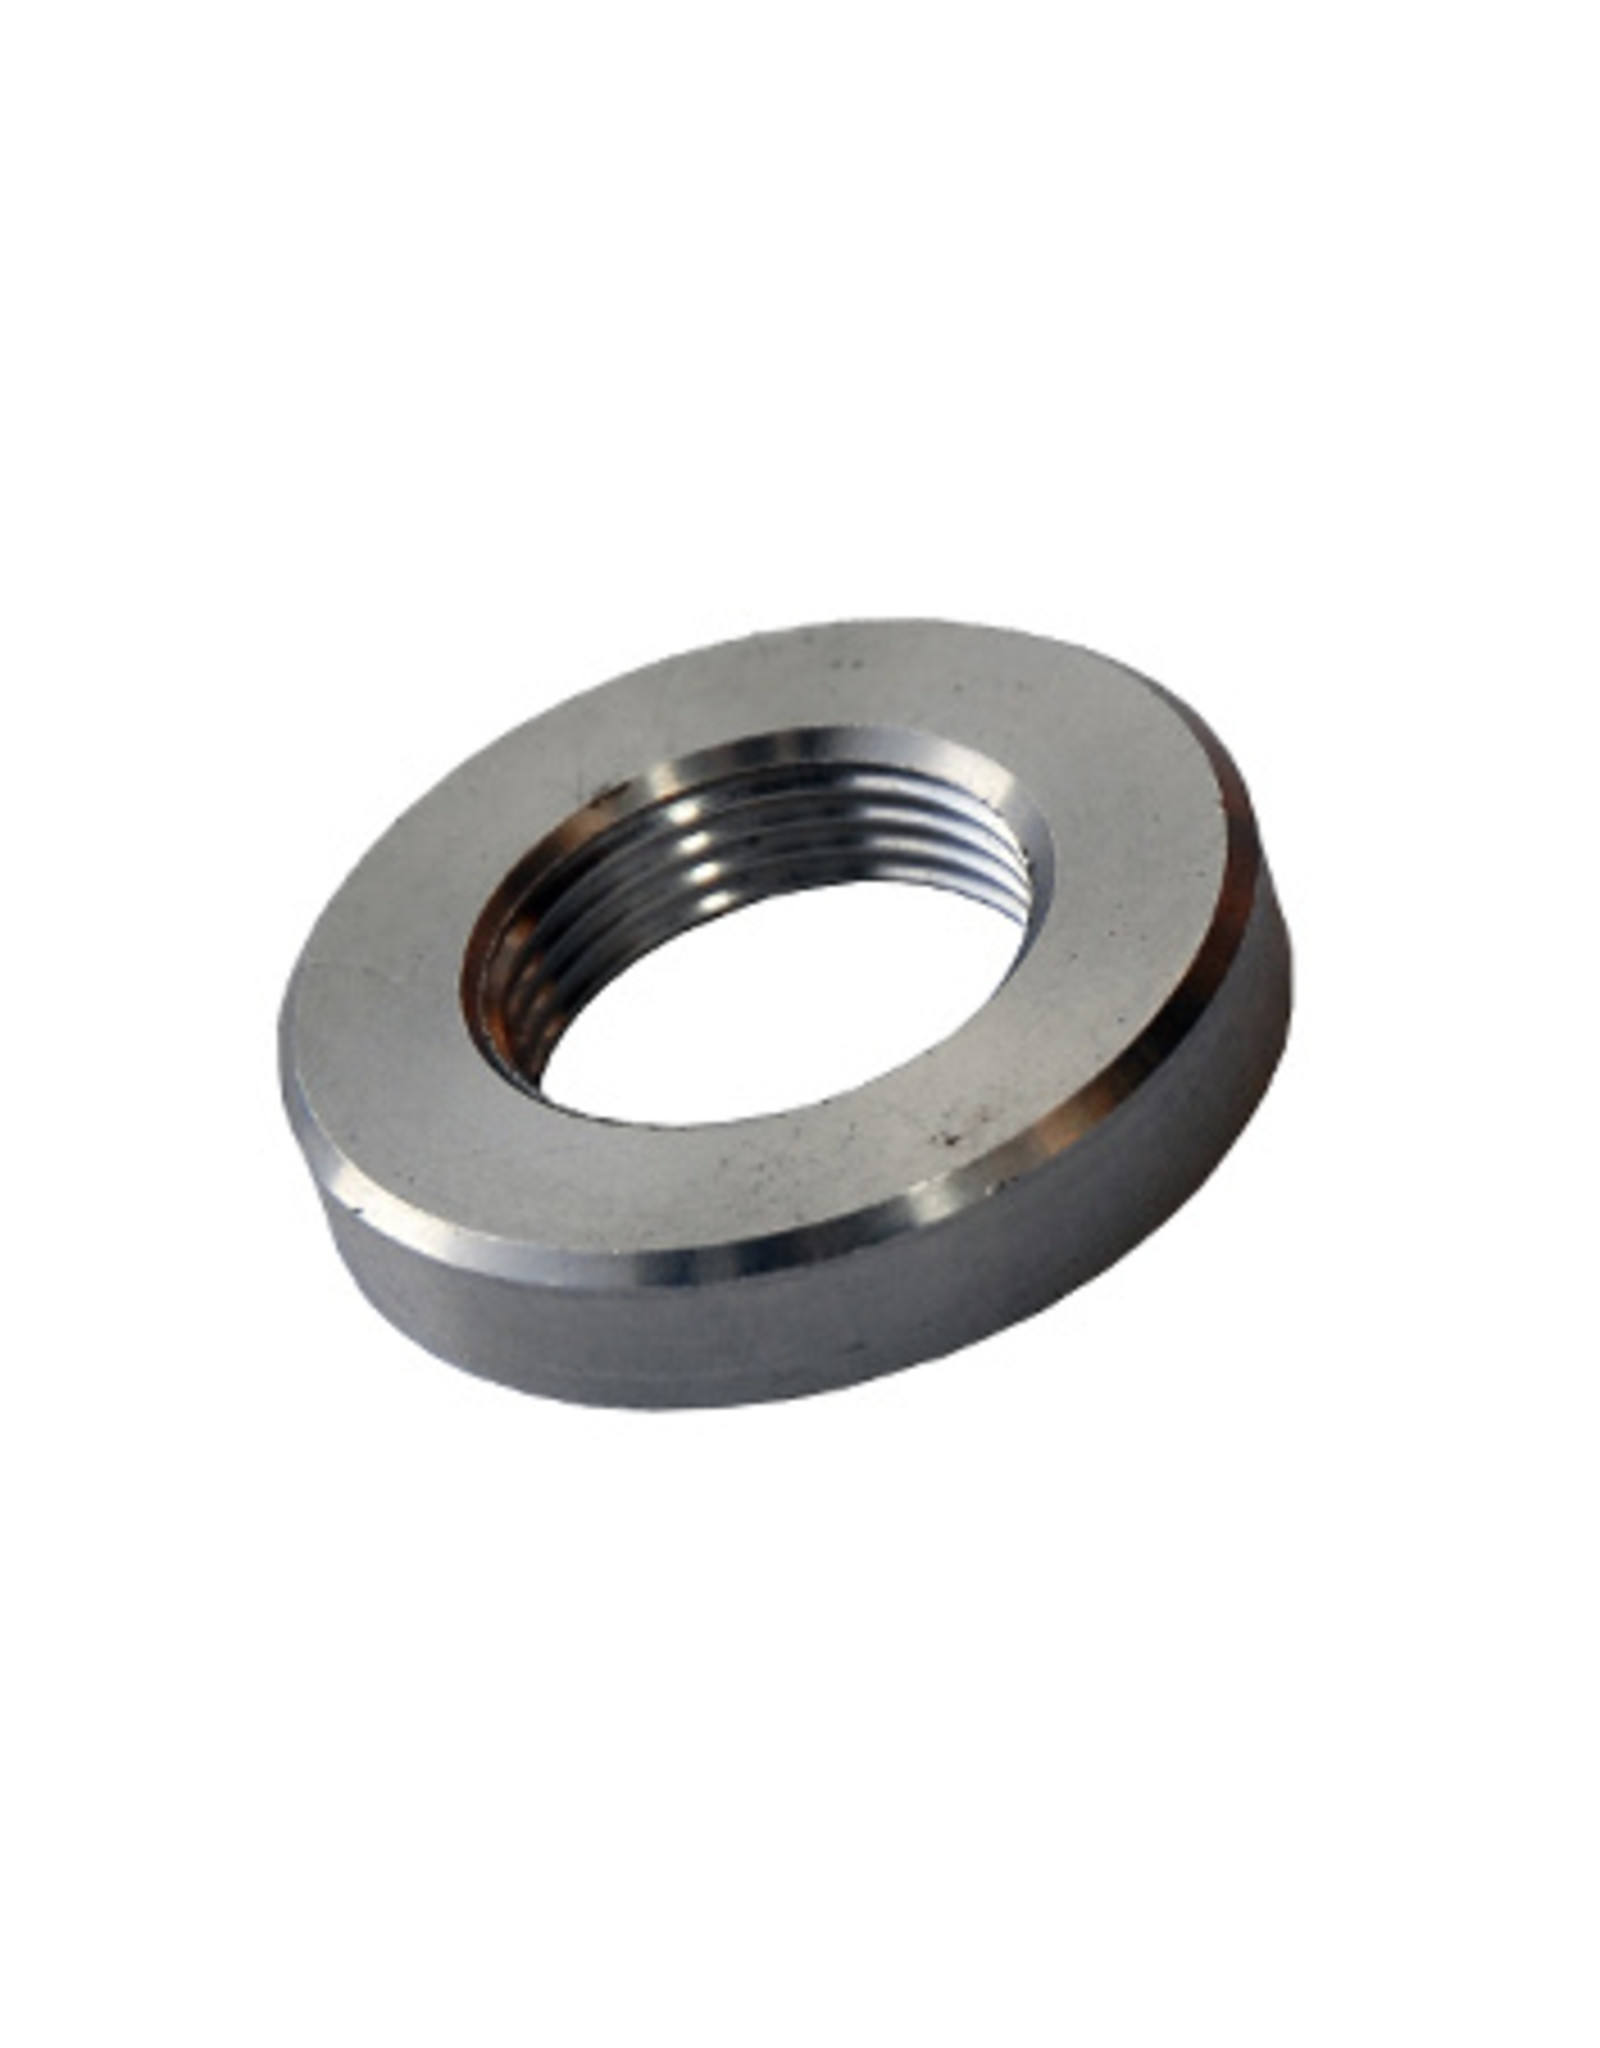 Revotec M22 x 1.5 Weld on Boss Aluminium